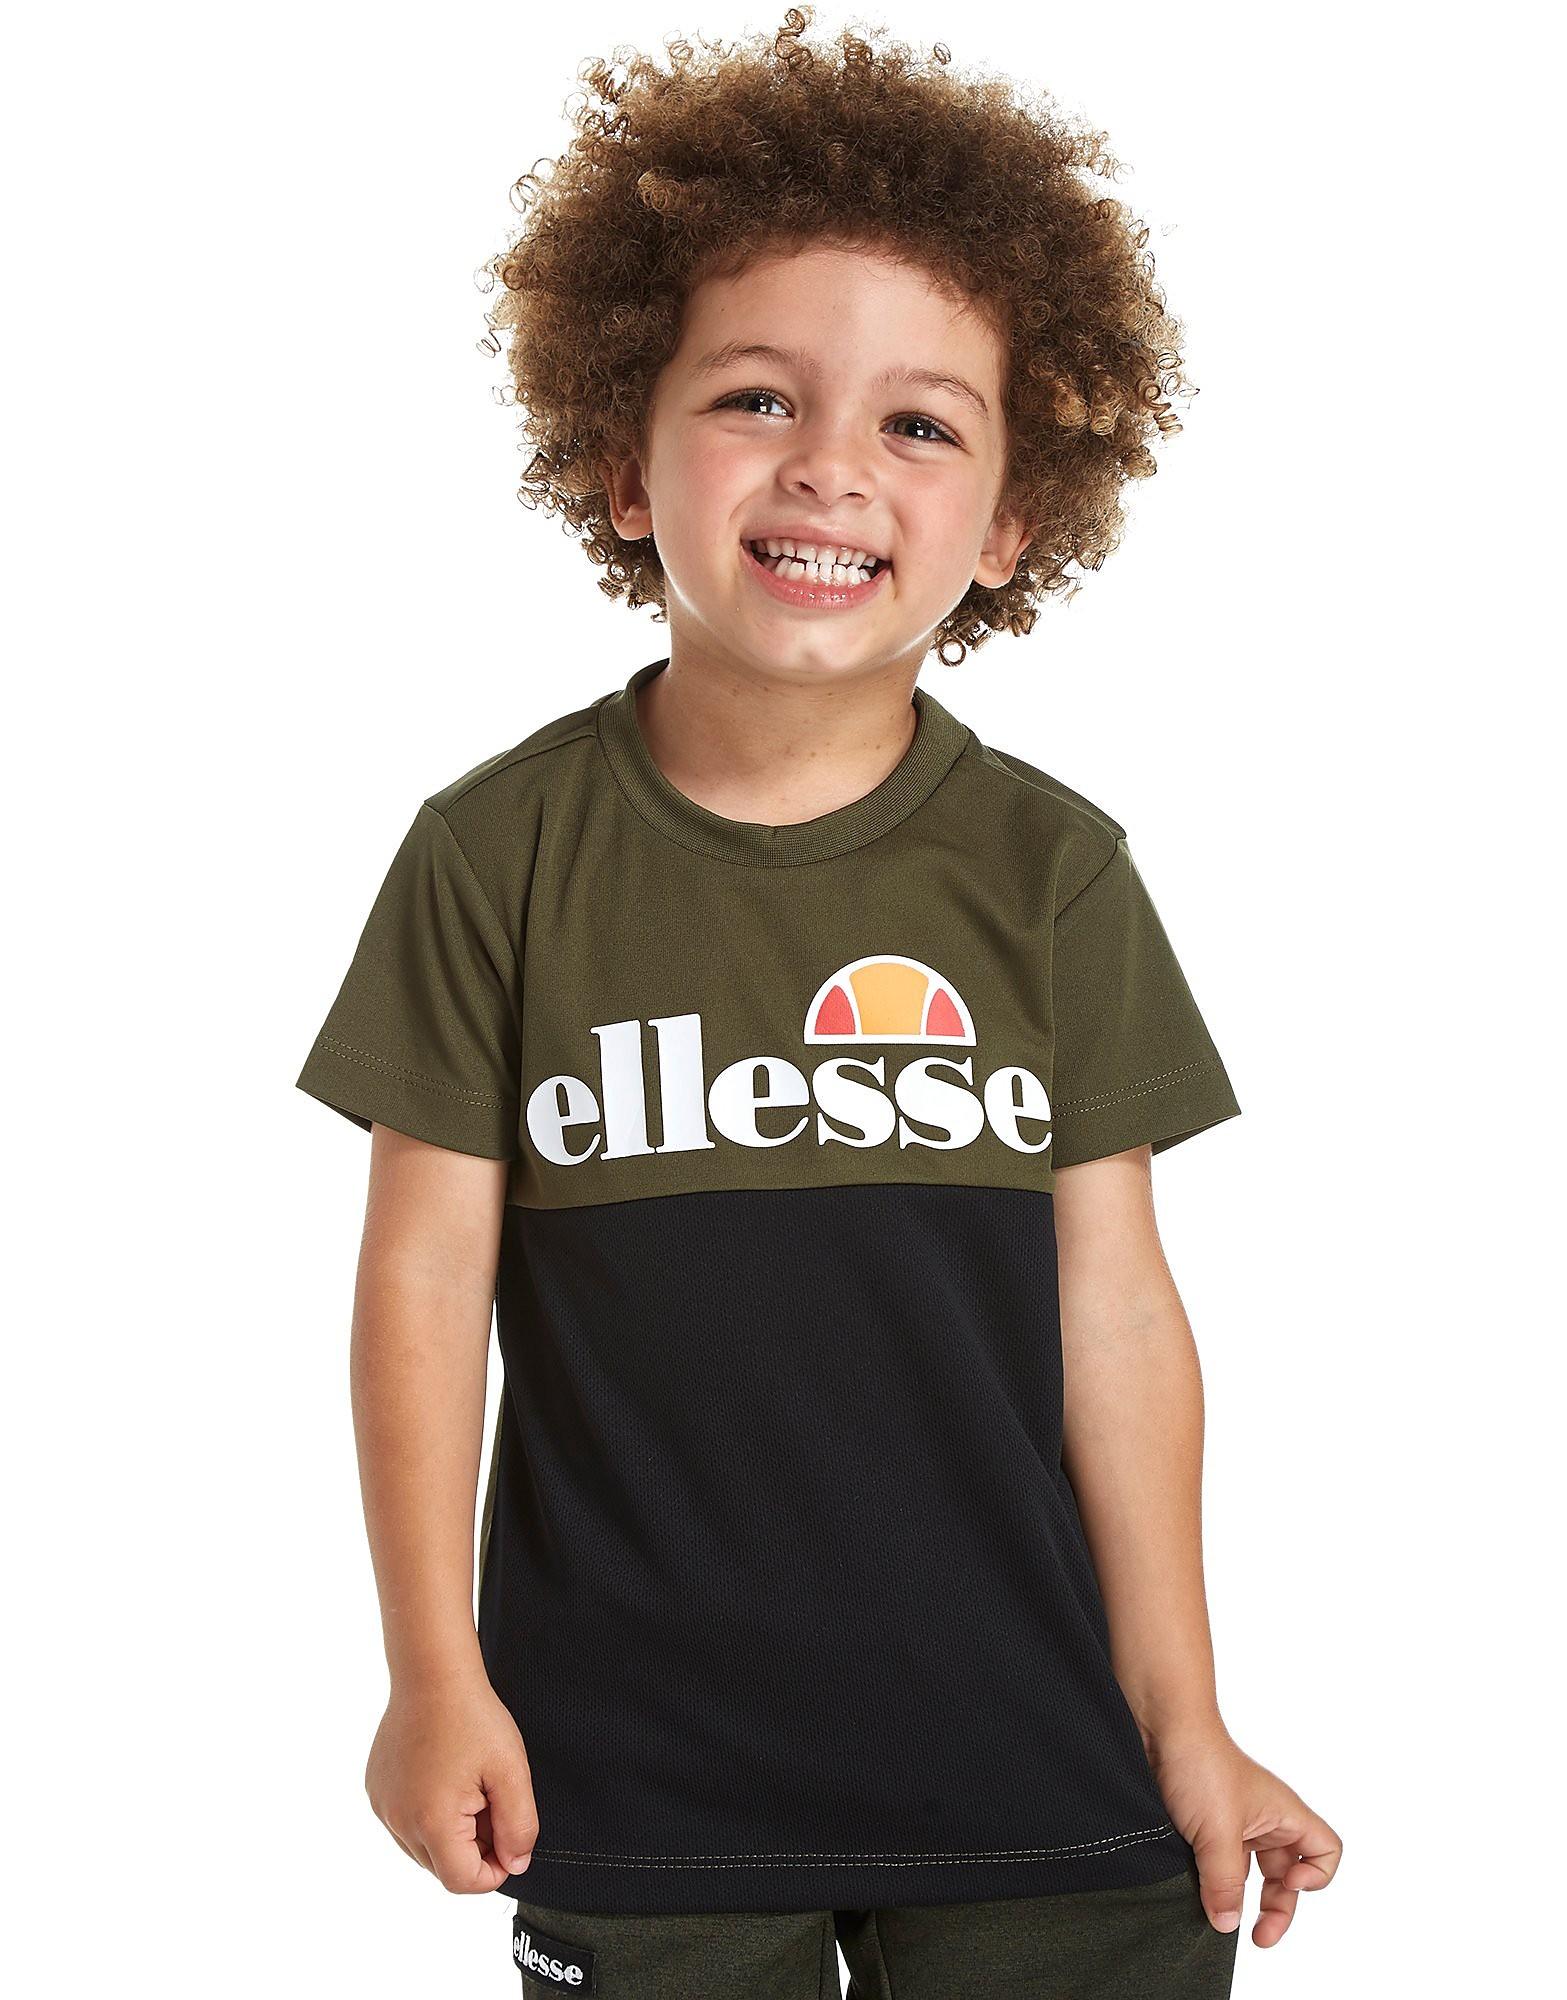 Ellesse Ricto Poly T-Shirt Children's